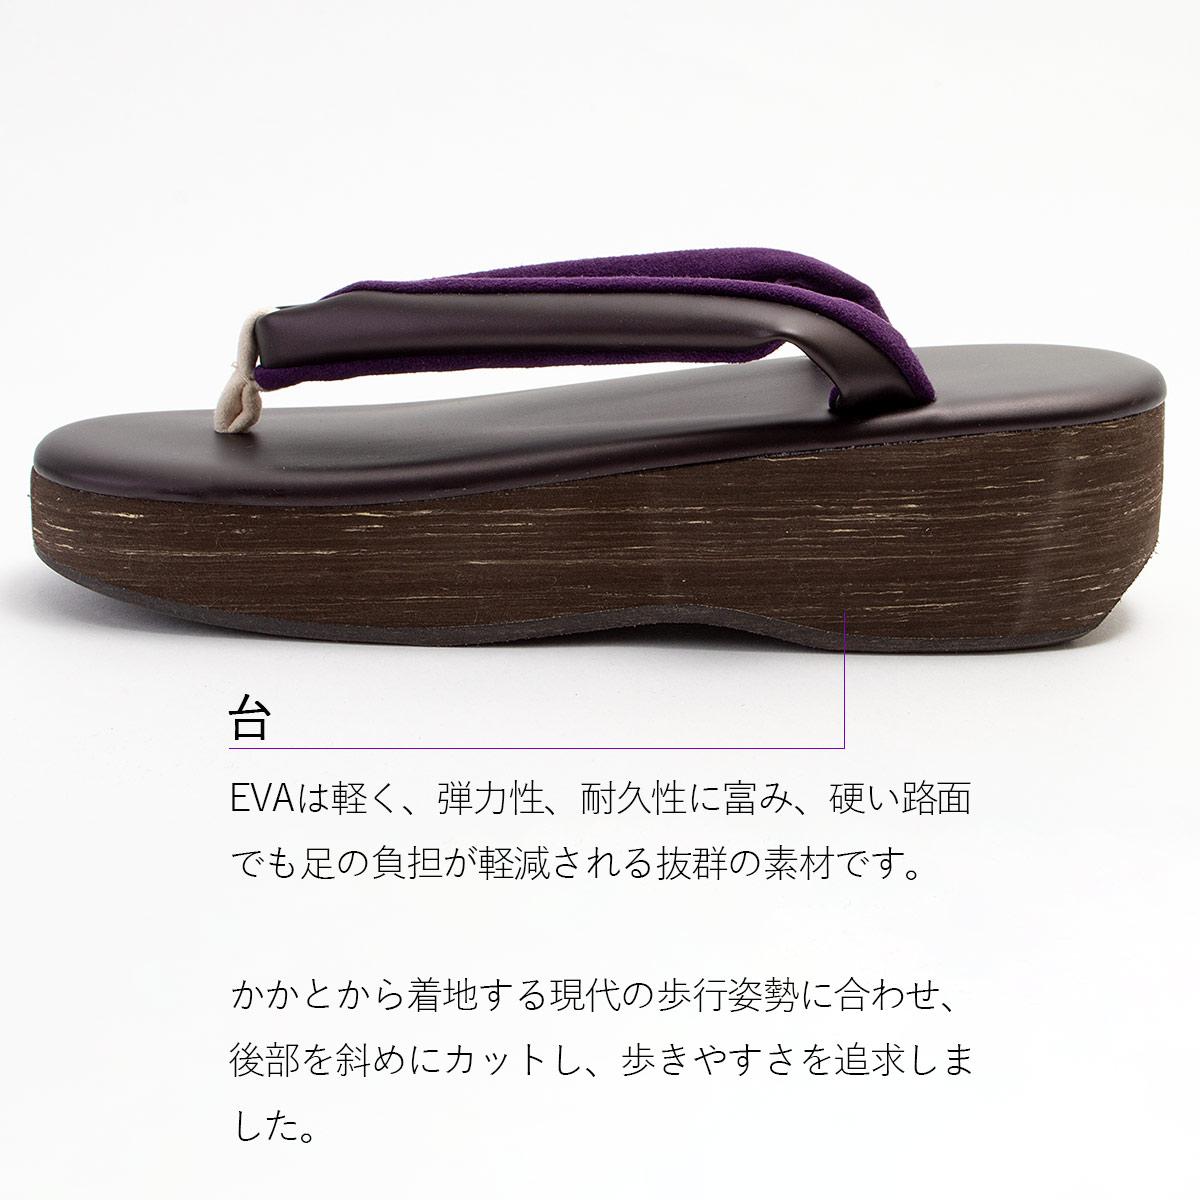 . HAKU 草履 NO.104 |ダークブラウン